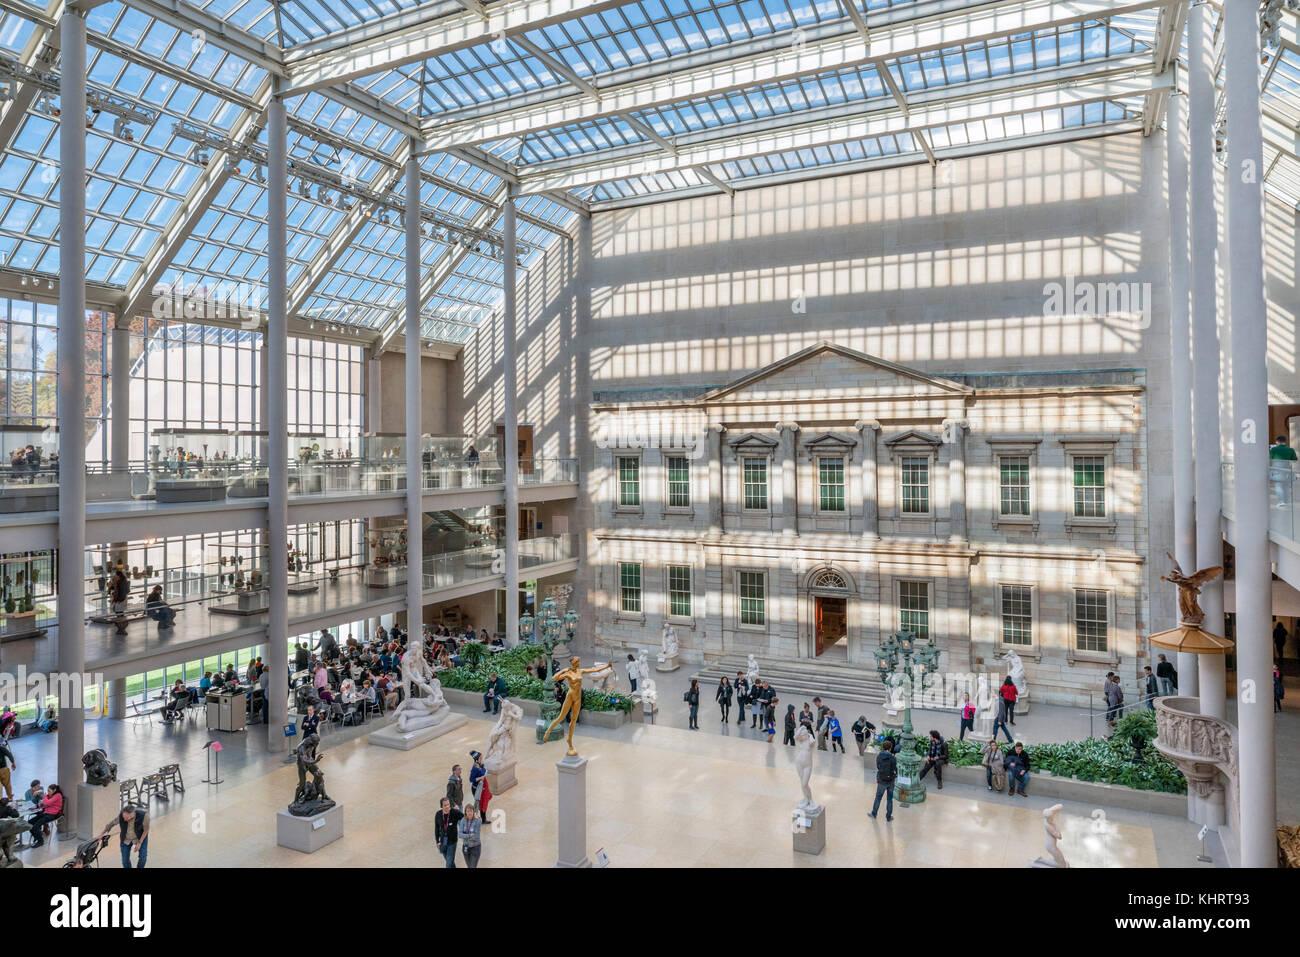 Innenraum des Metropolitan Museum der Kunst, 5th Avenue, Manhattan, New York City, NY, USA Stockbild